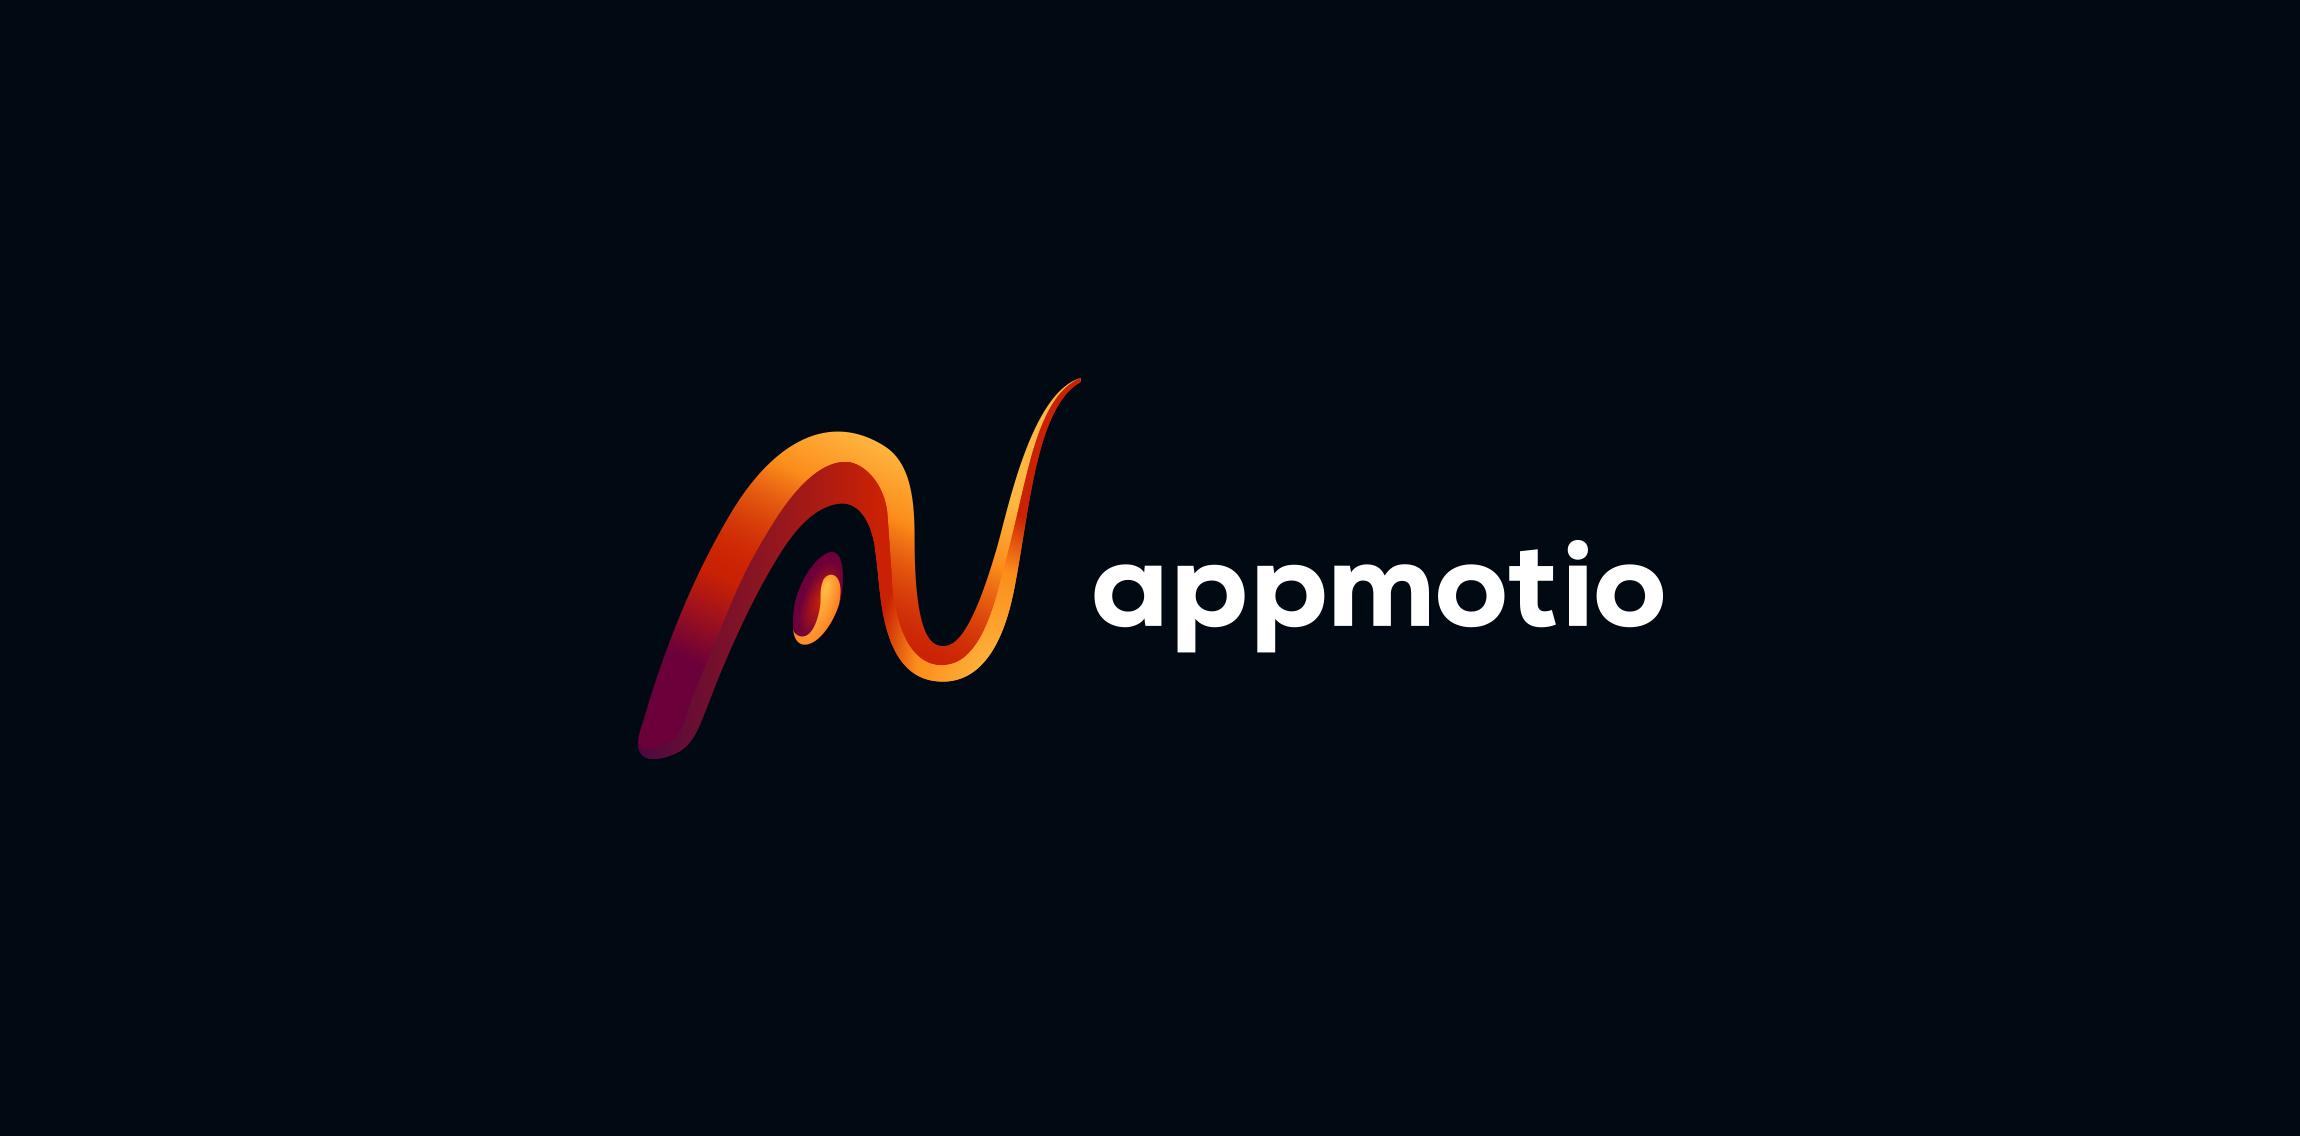 appmotio